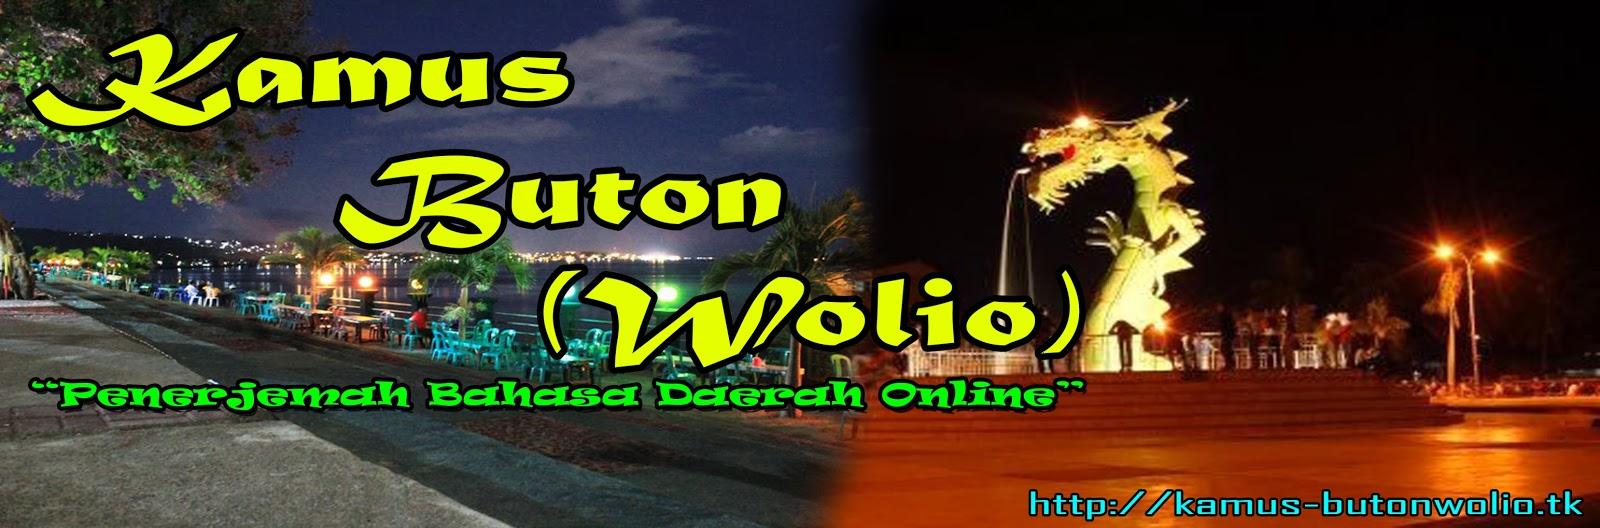 Kamus Buton (Wolio)